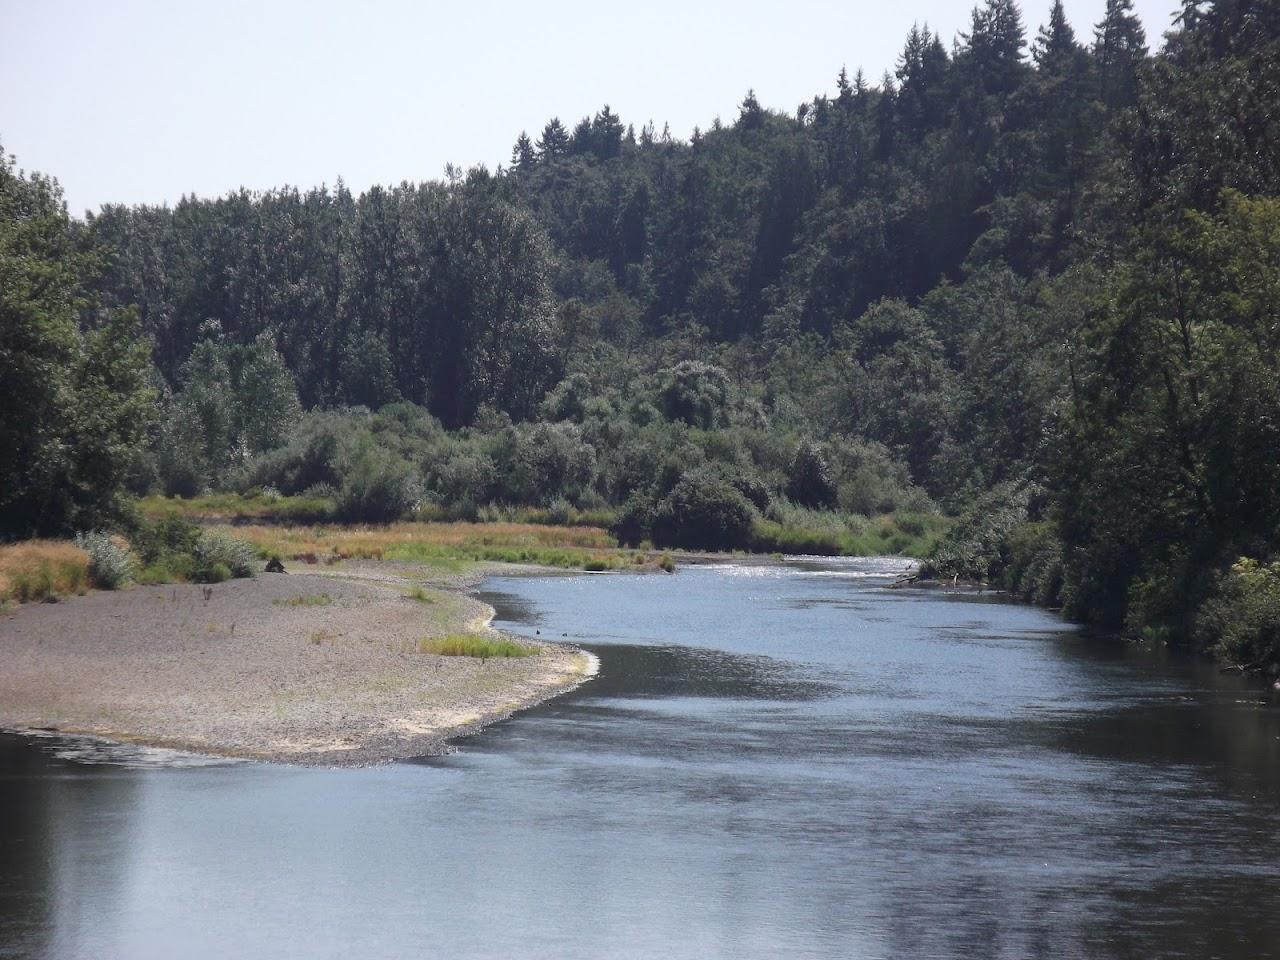 Skookumchuck River 2012 - DSCF1825.JPG